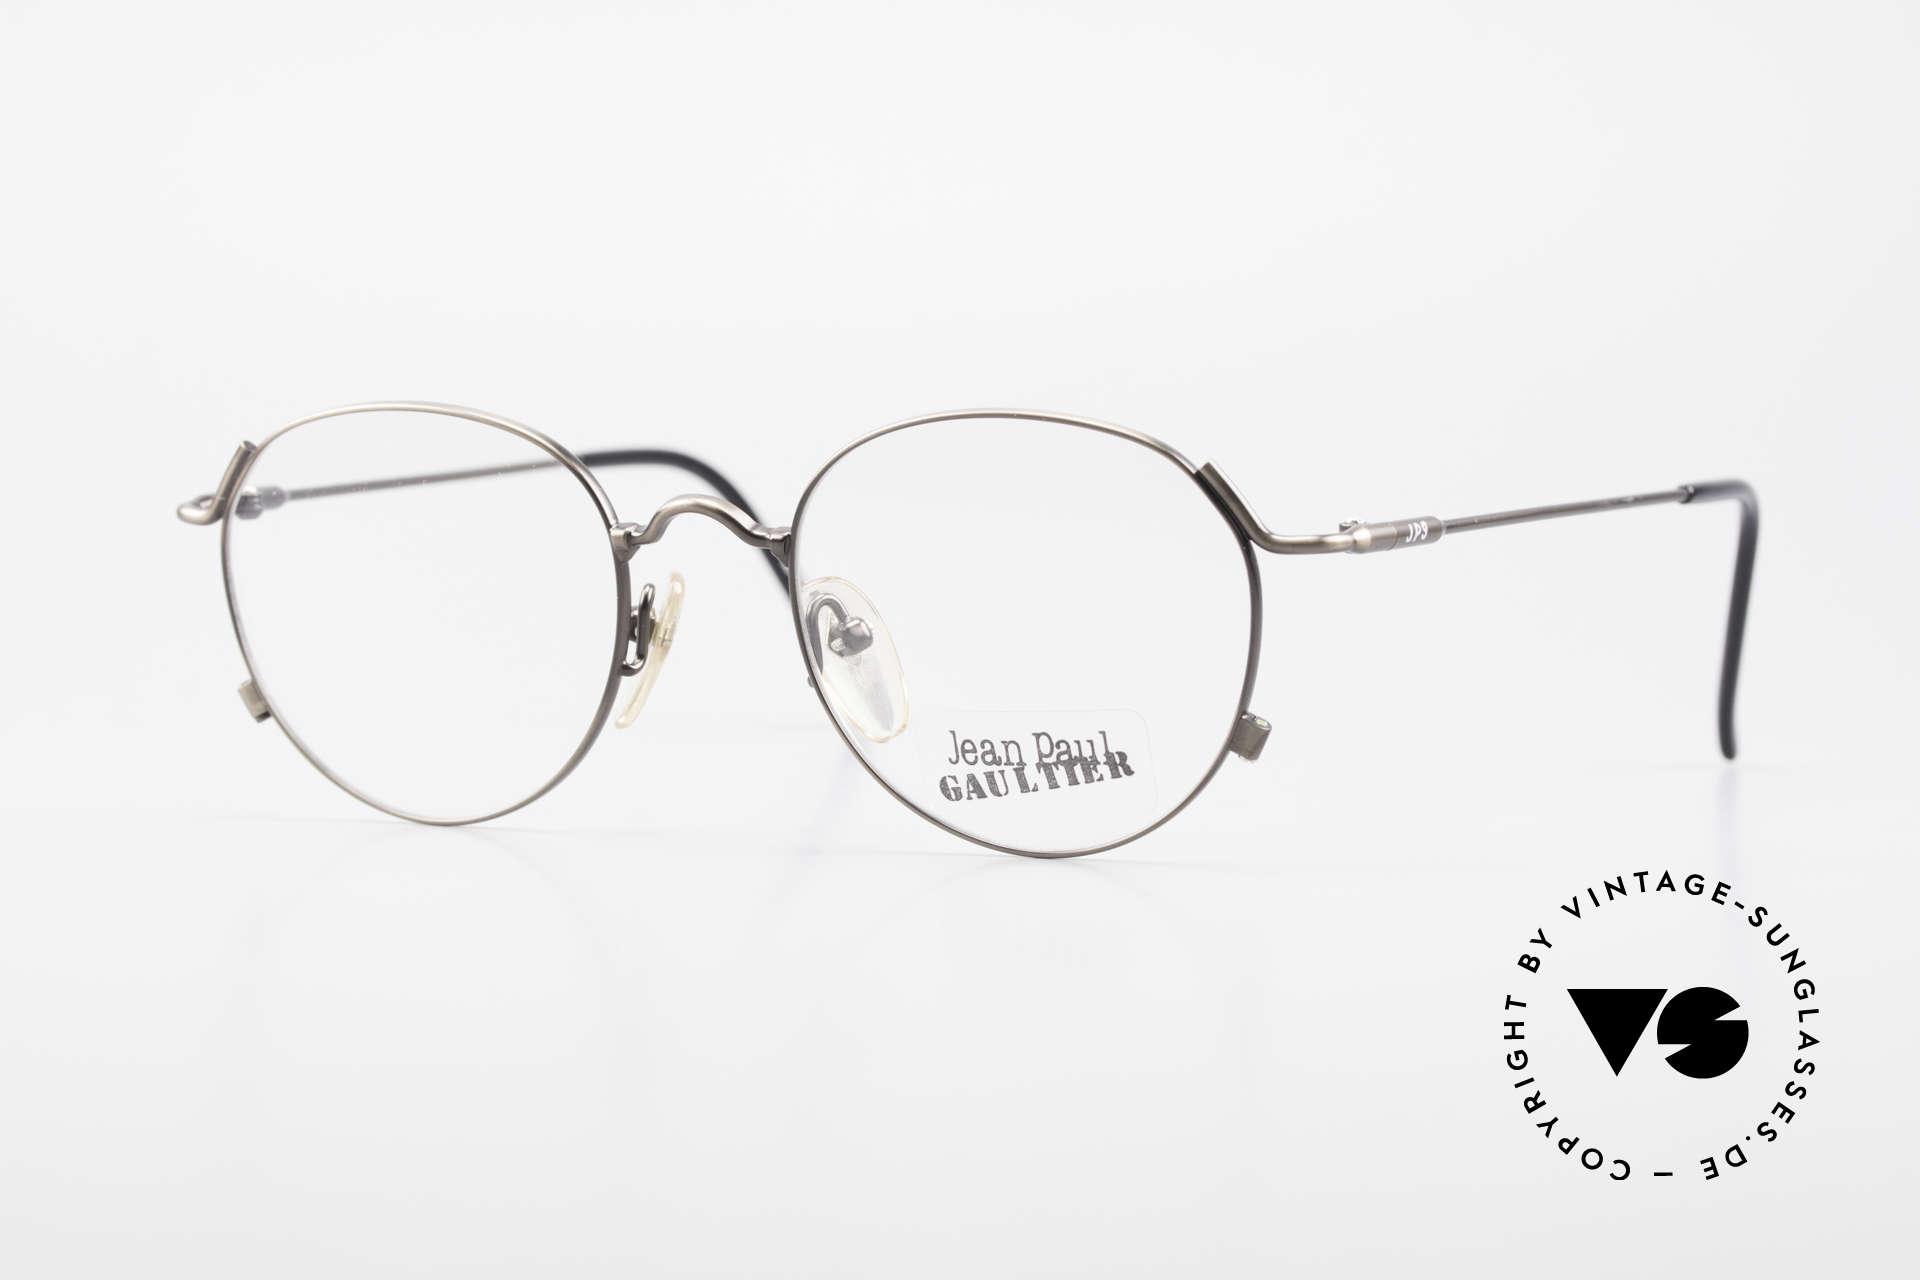 Jean Paul Gaultier 55-2176 JPG Panto Glasses 90s Original, unique designer frame by Jean Paul GAULTIER, Made for Men and Women